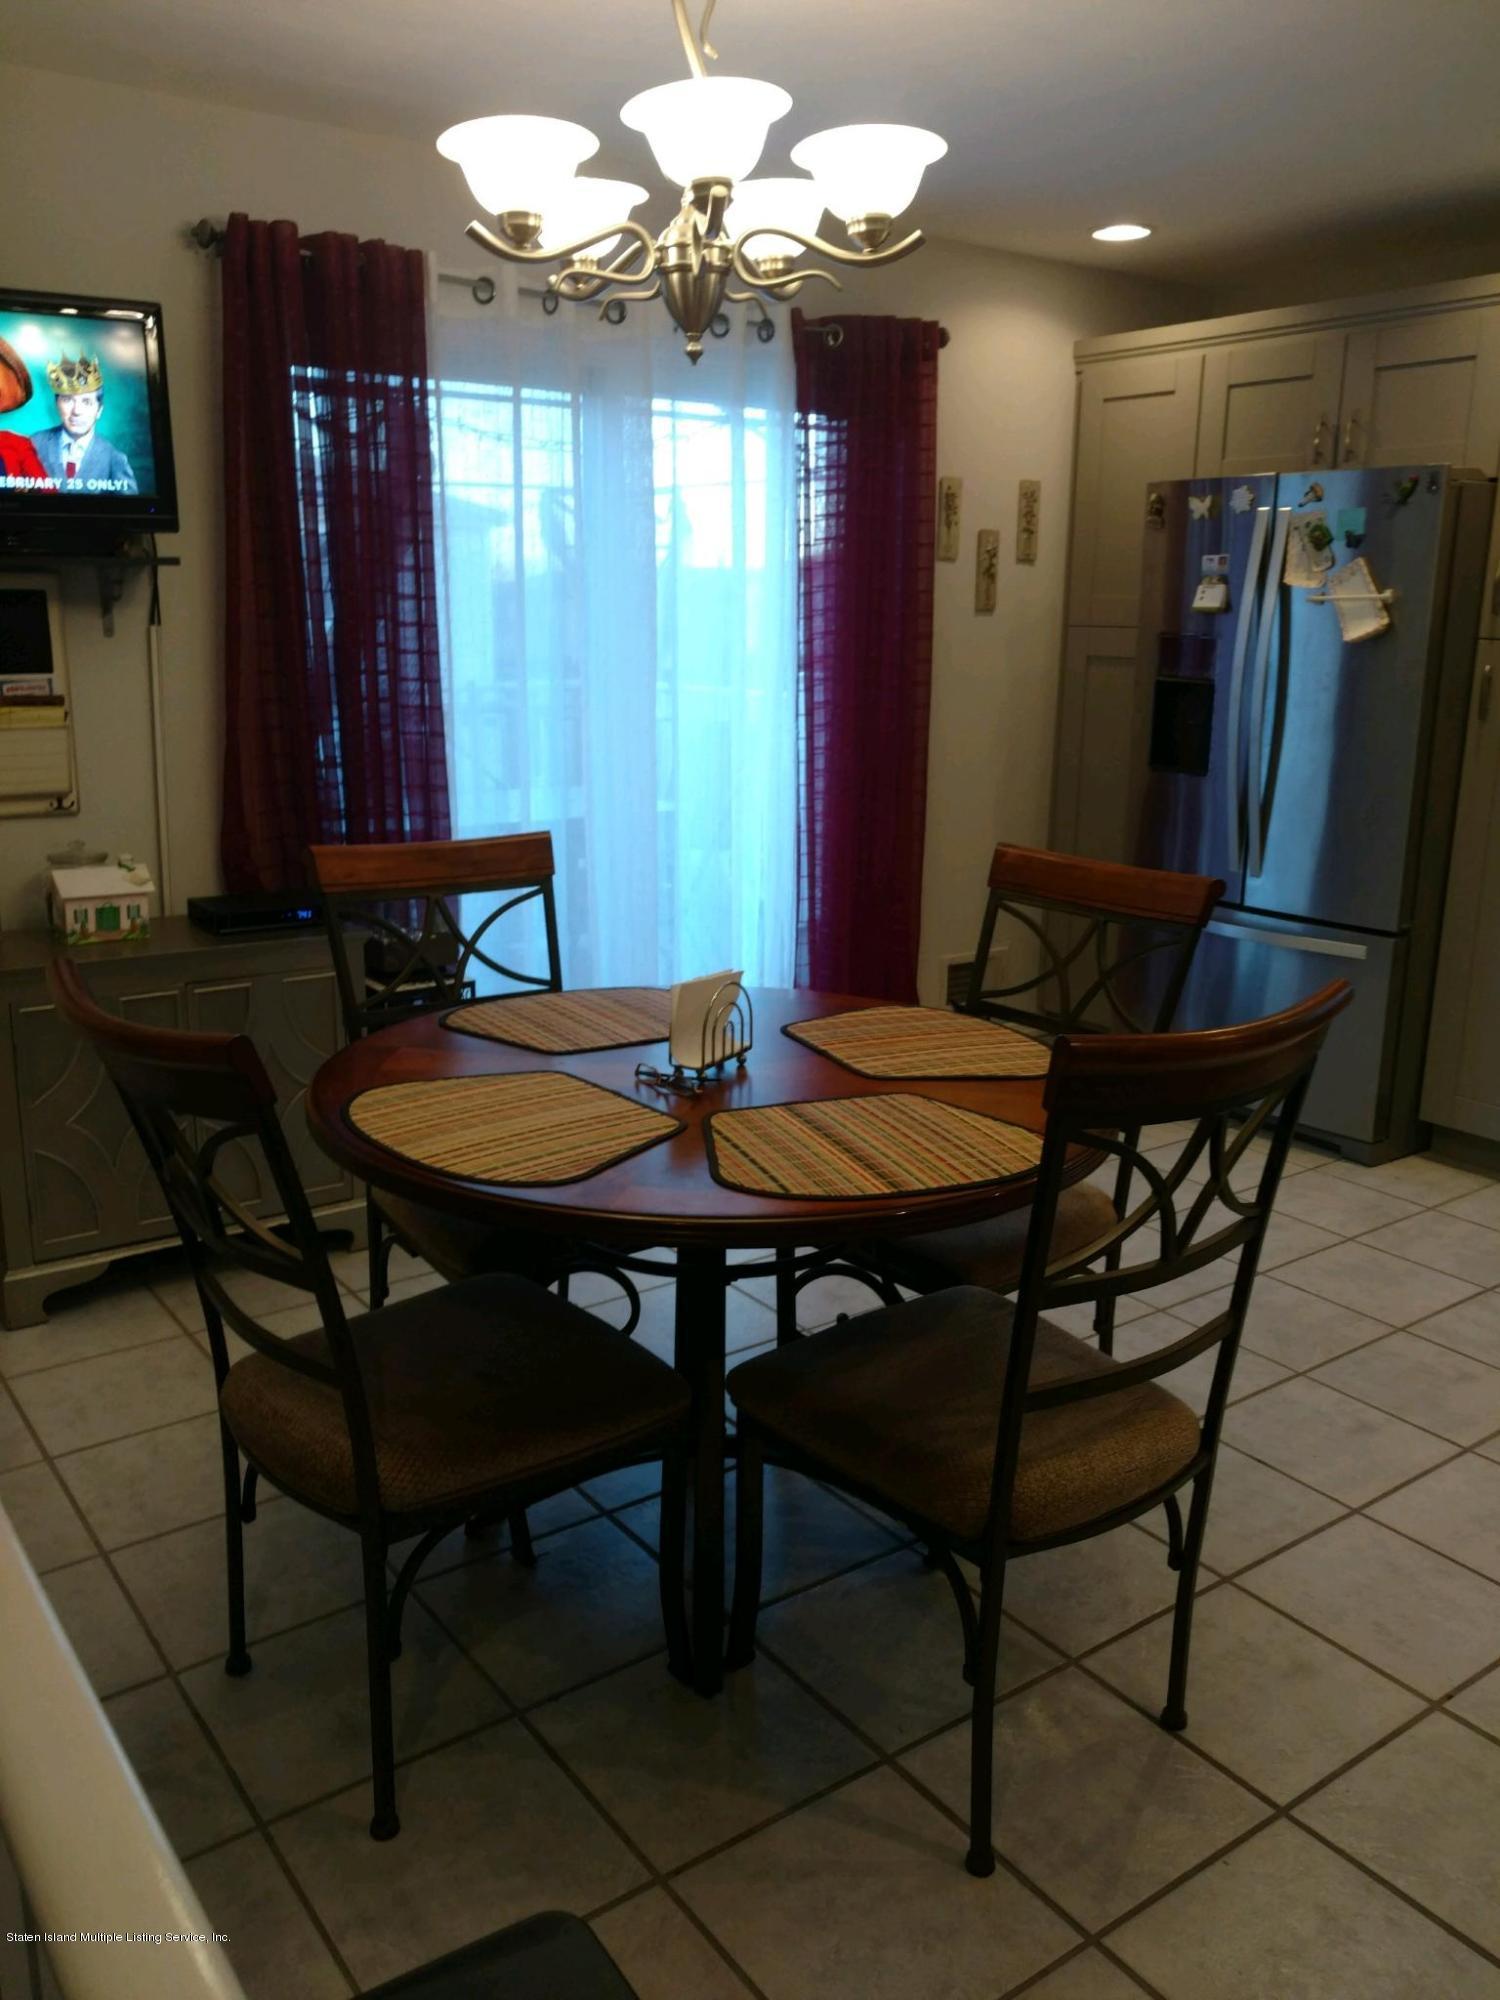 Single Family - Semi-Attached 102 Stack Drive  Staten Island, NY 10312, MLS-1115880-13